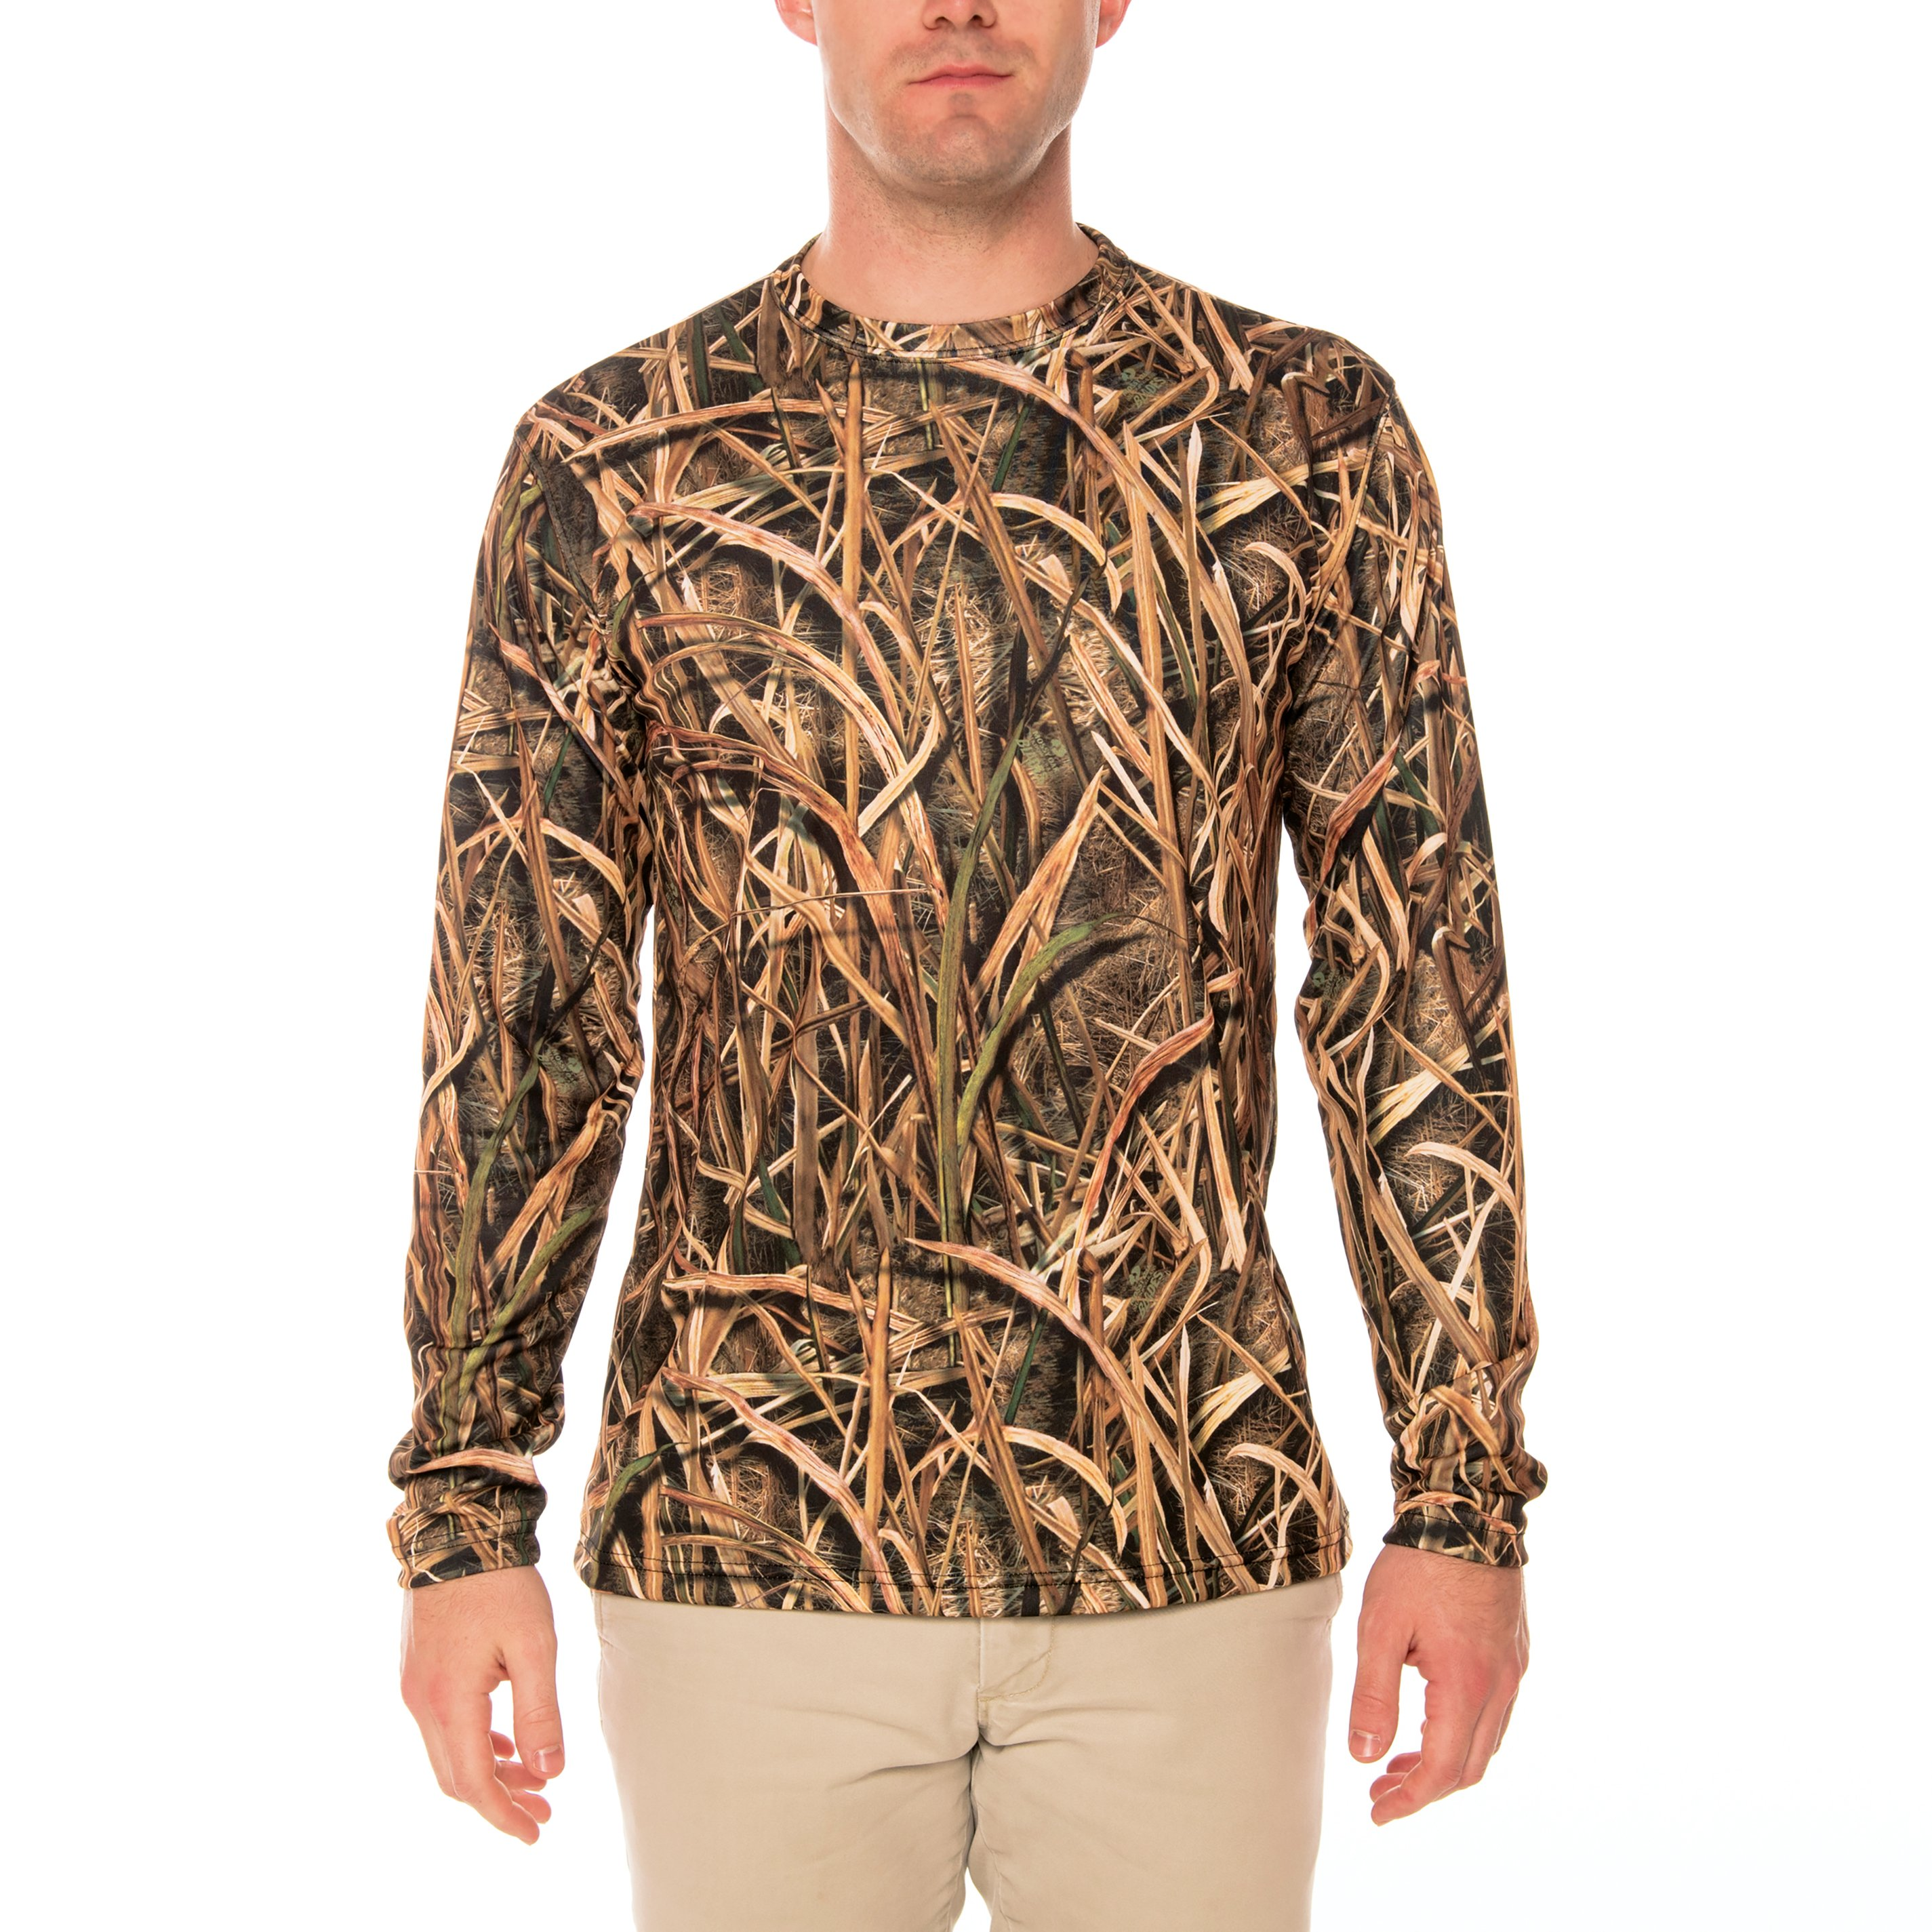 Youth Boys Girls Mossy Oak Its Not a Passion Hoodie Sweatshirt Black Size Medium